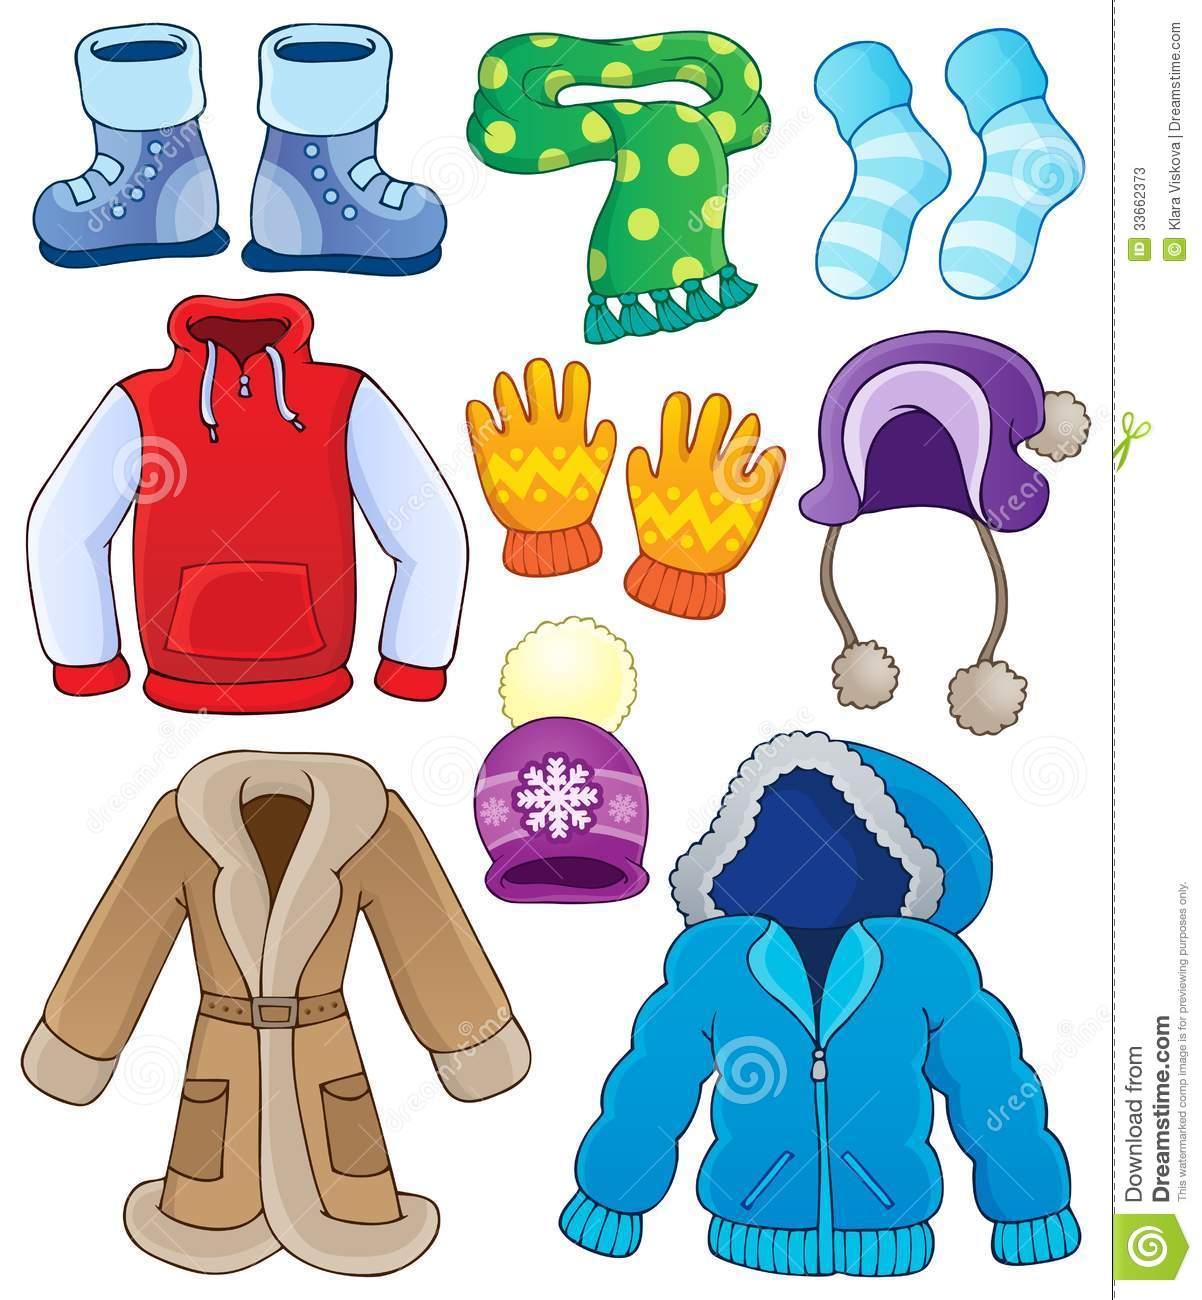 Winter clothes clipart #3